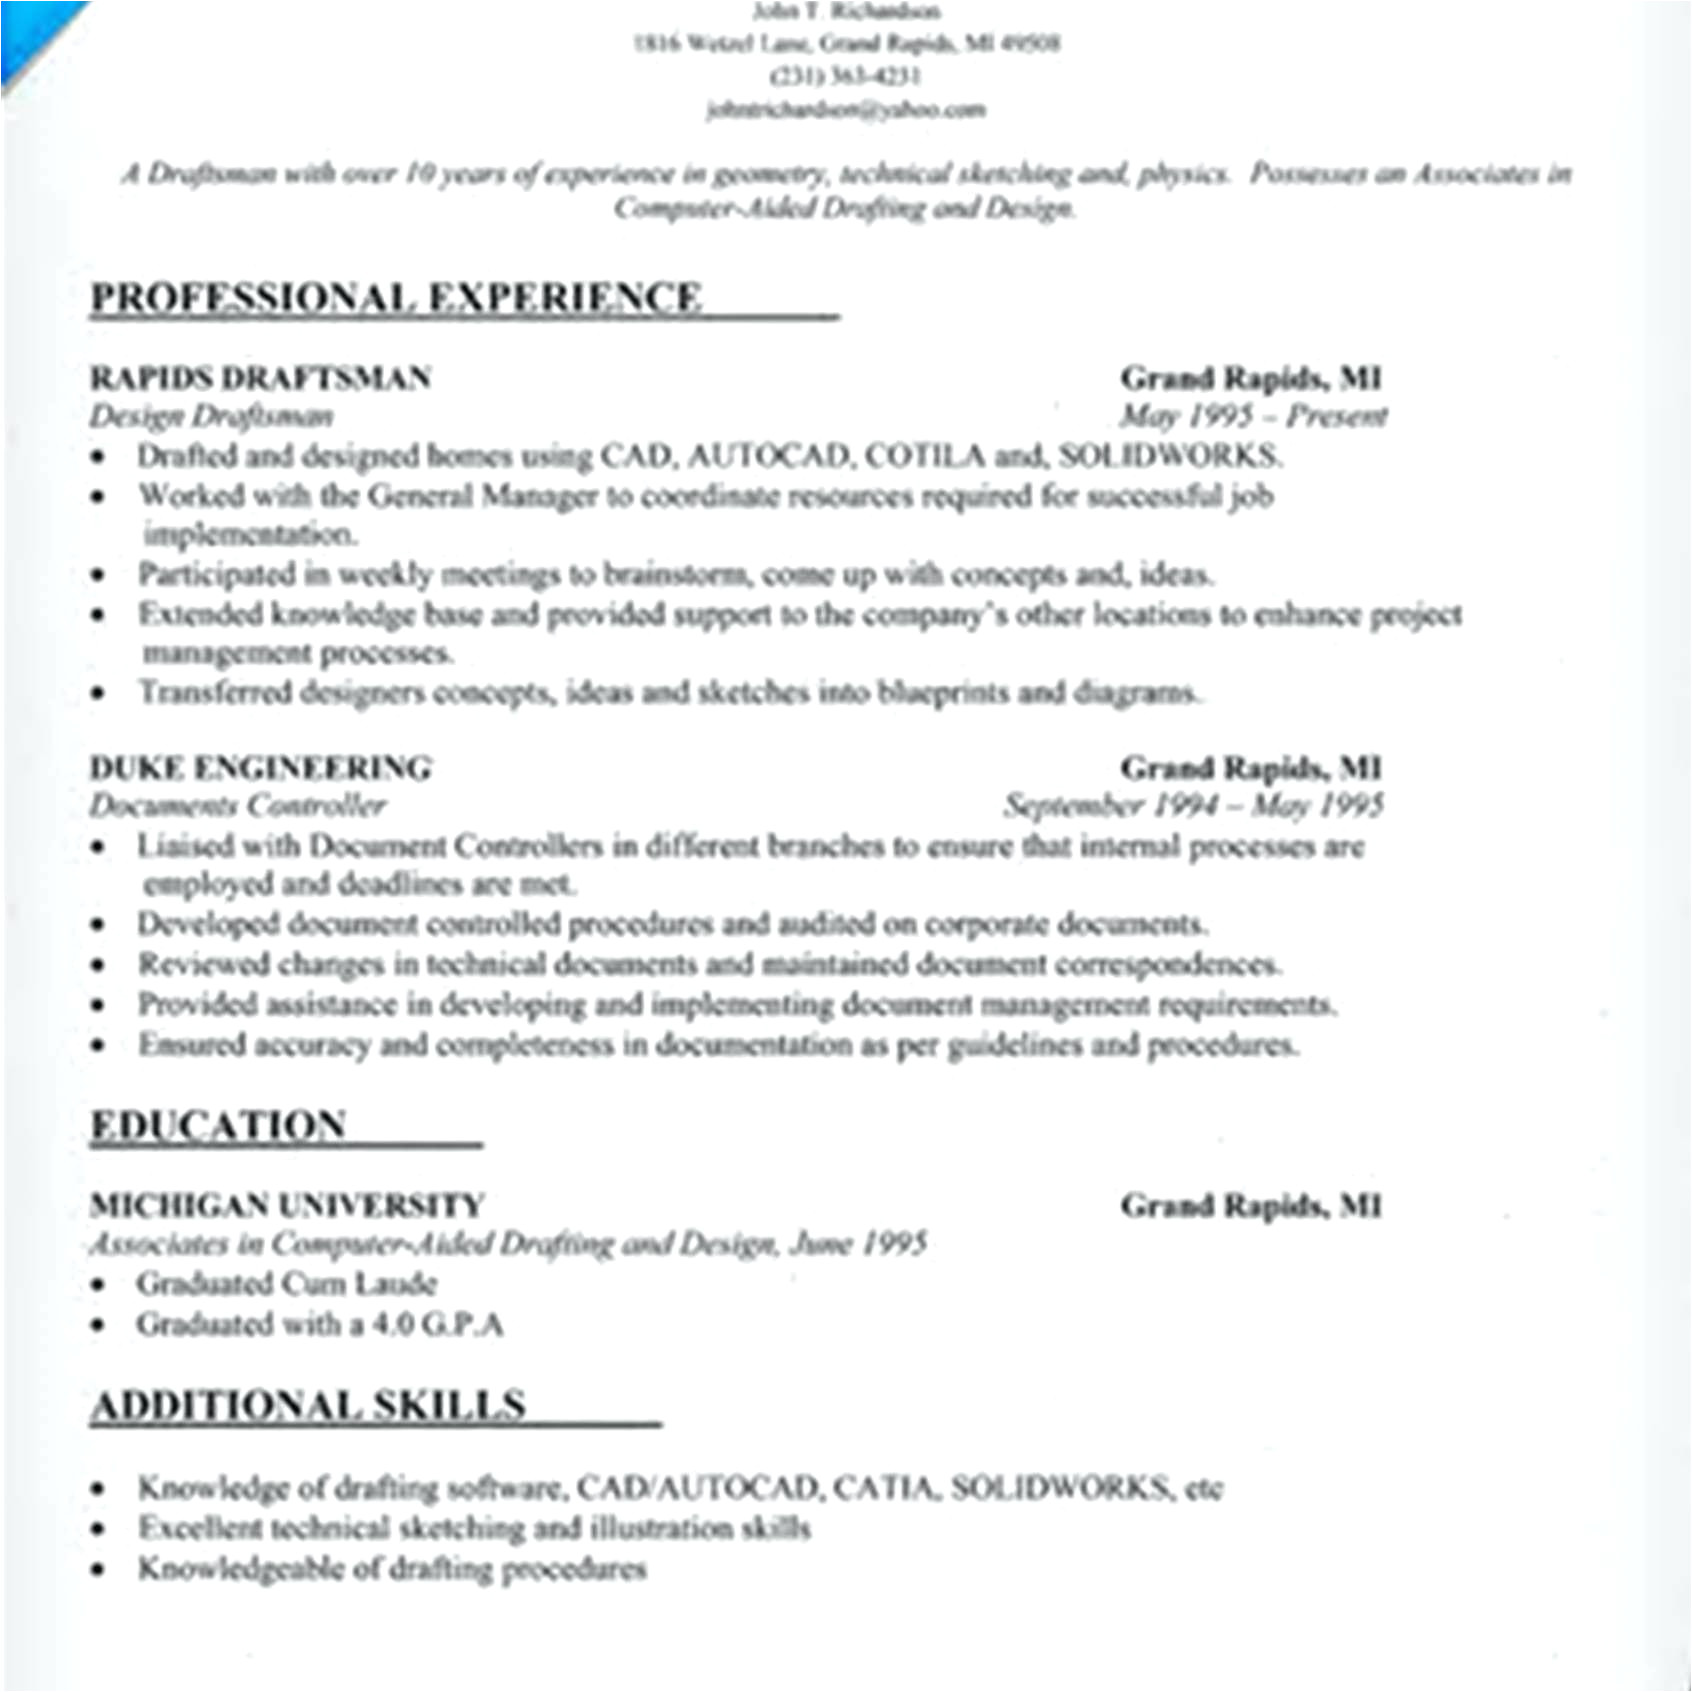 Sample Resume for Architectural Draftsman Cad Resume Eezeecommerce Com